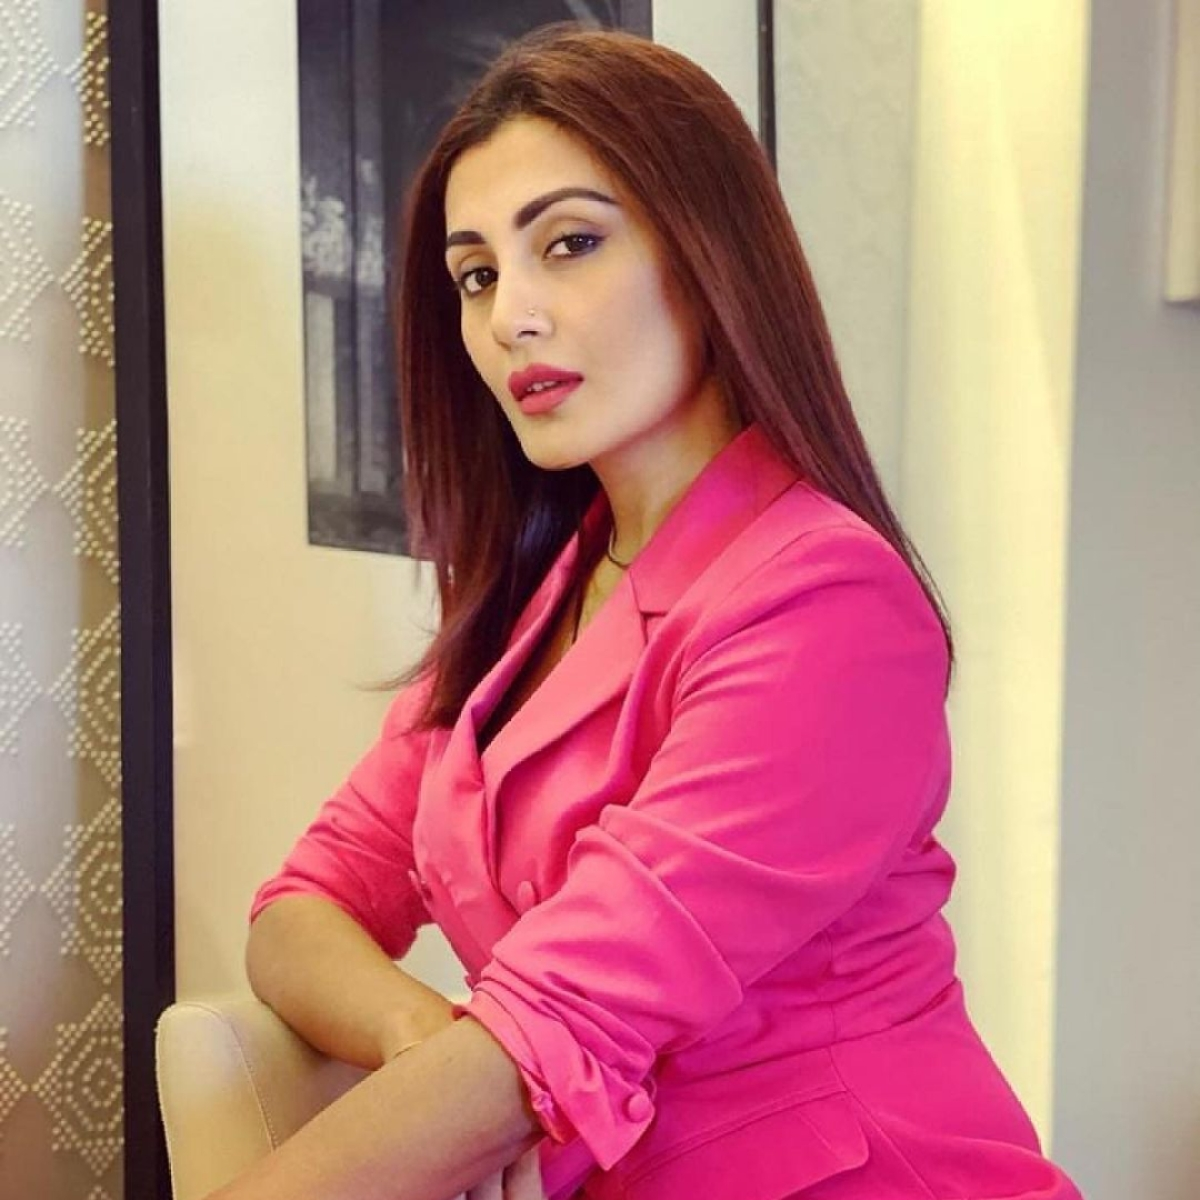 'Dhoom' actress Rimi Sen says Salman Khan's 'Bigg Boss' was like a 'rehab'